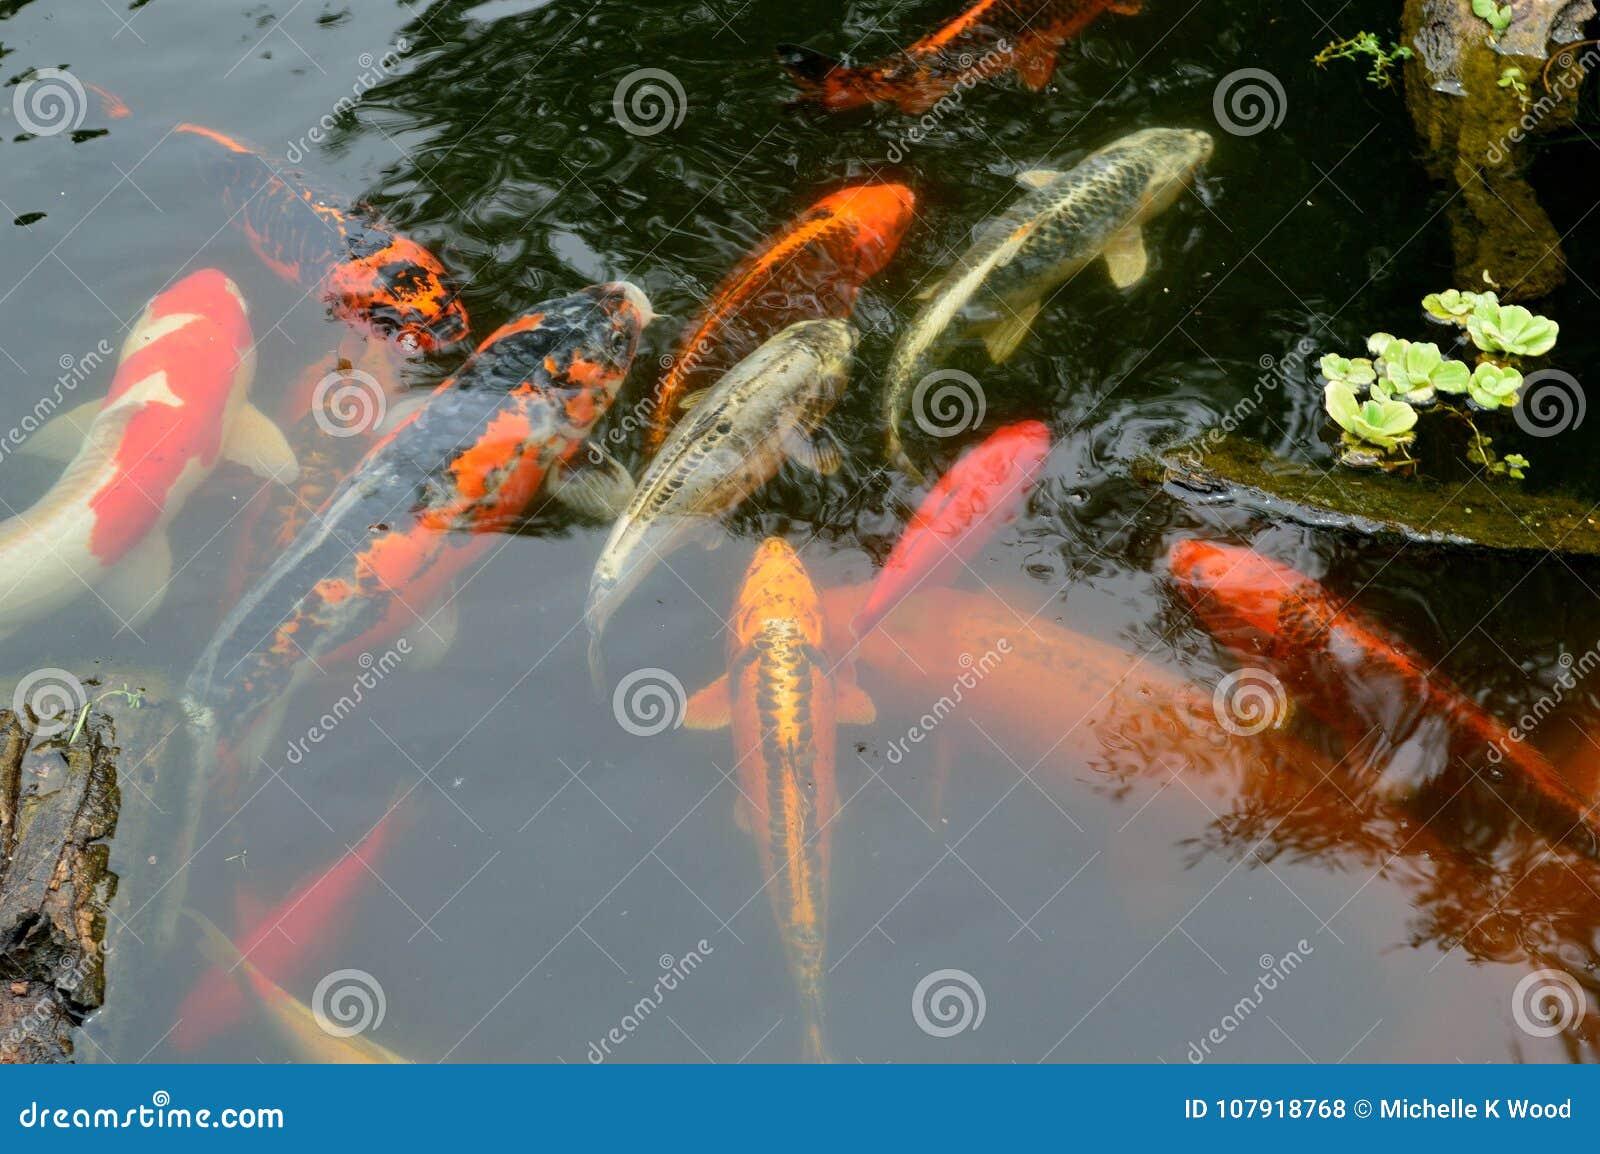 Koi carp pond with rocks and plants